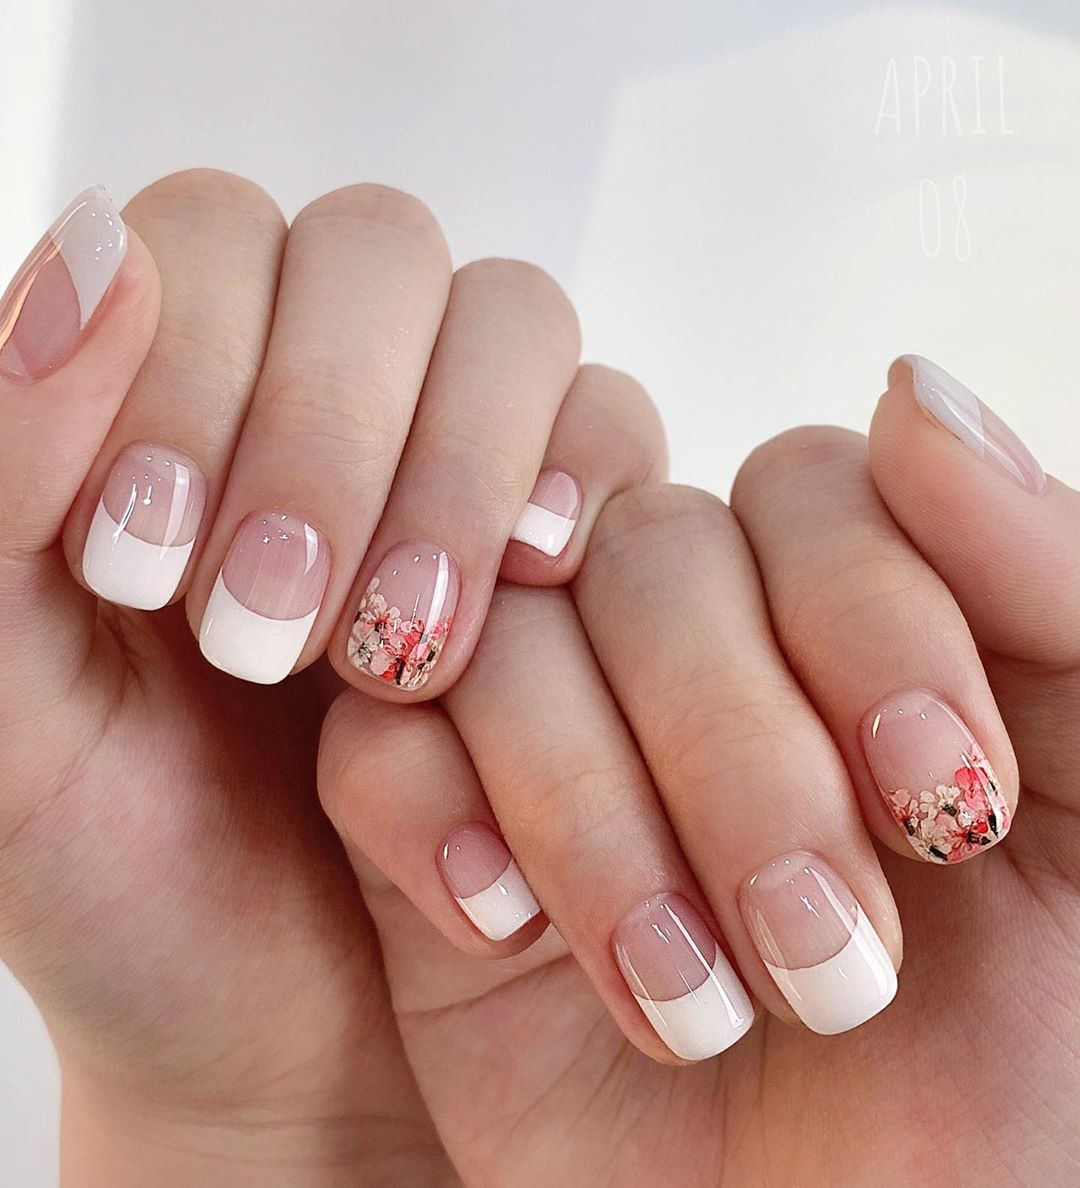 Floral Prints, White Tips White Nail Art Designs